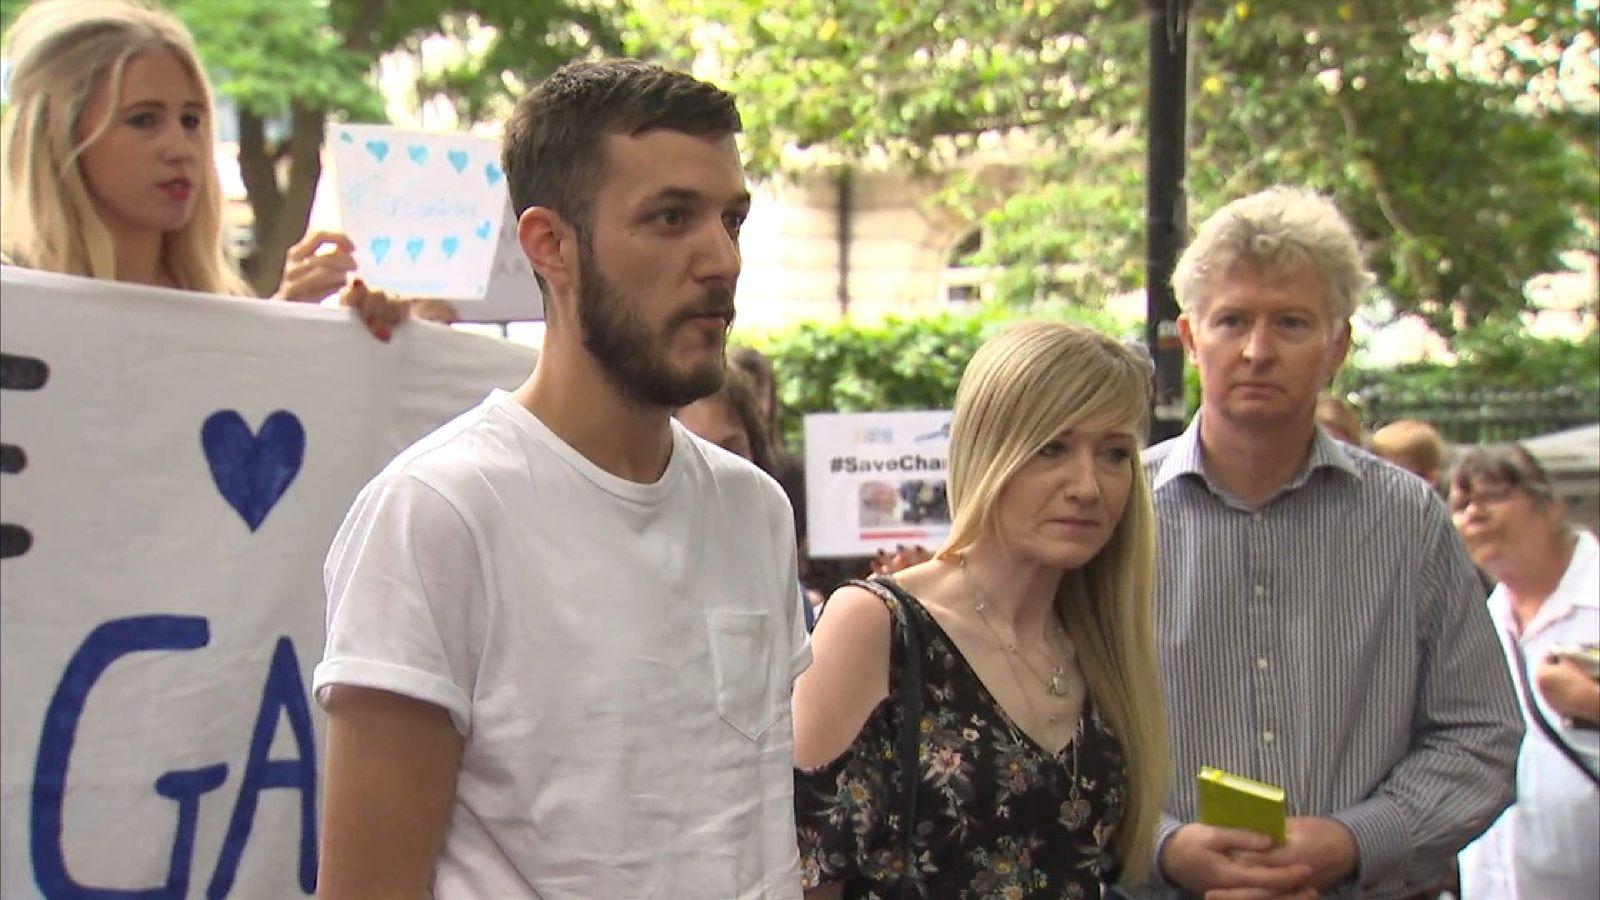 Charlie's parents spoke outside Great Ormond Street Hospital